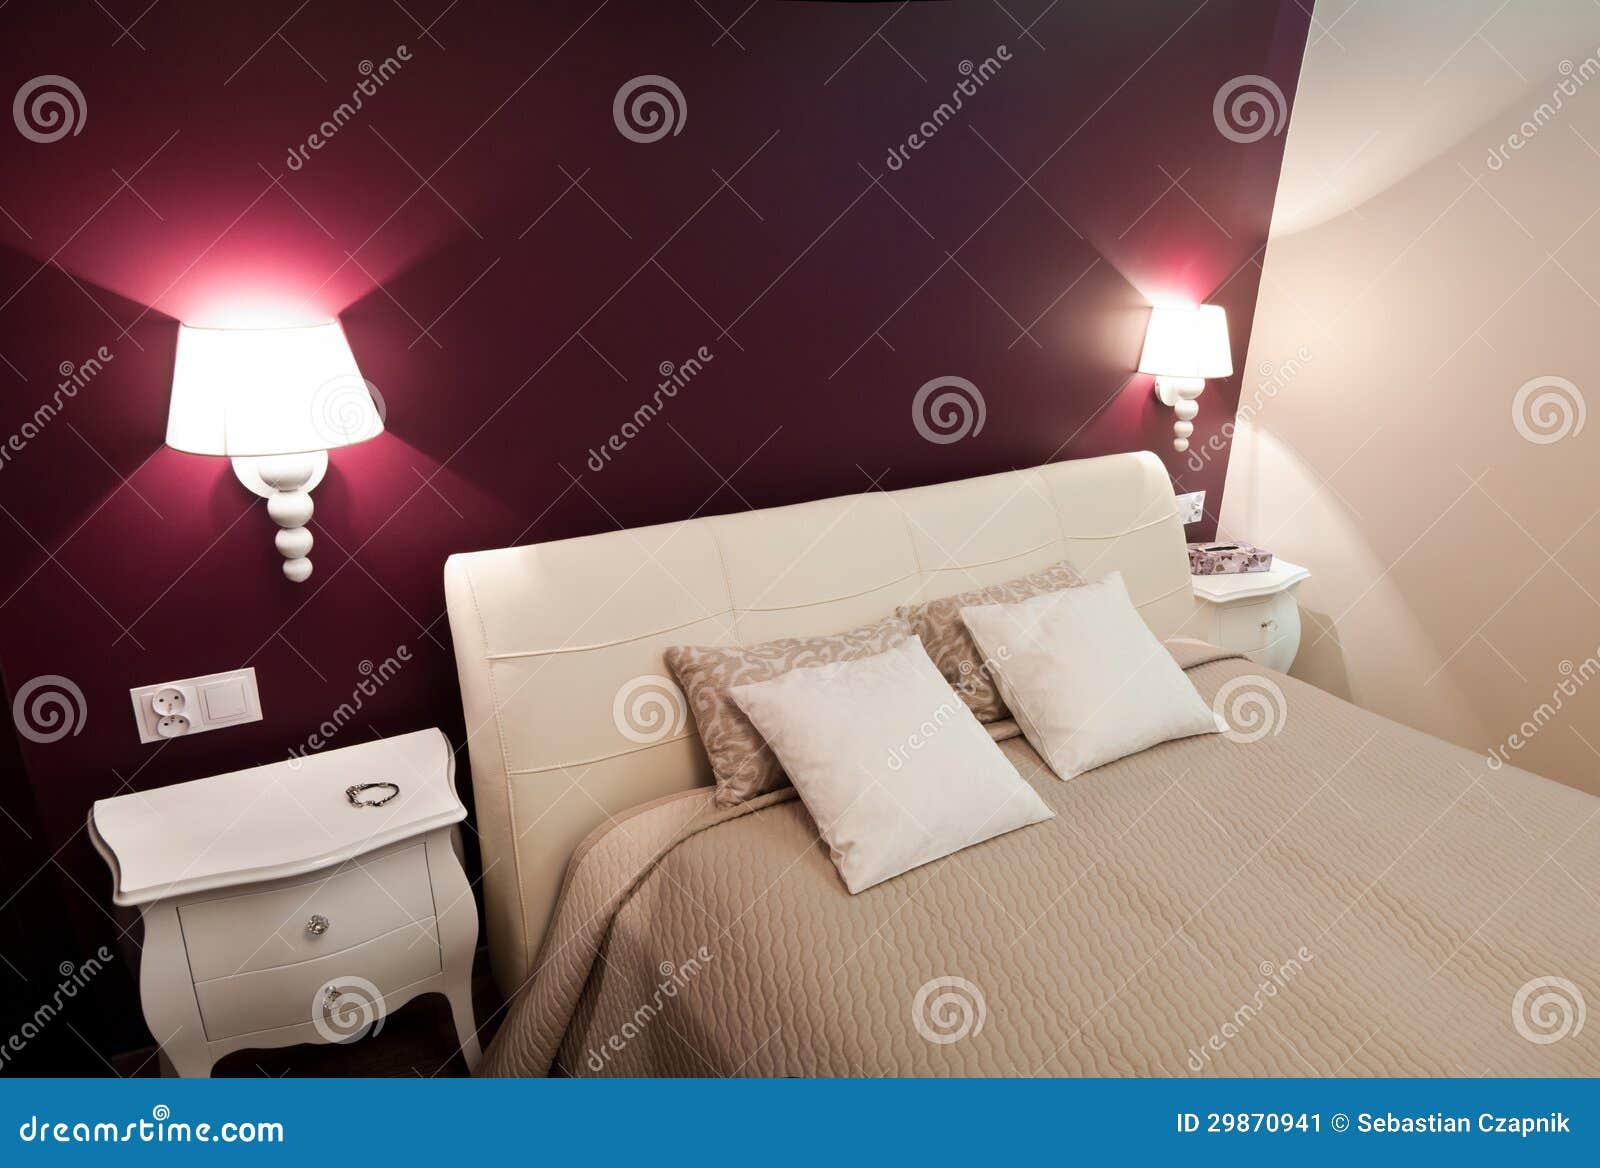 Color Prugna Per Pareti : Purple bedroom stock image. image of bedcover details 29870941